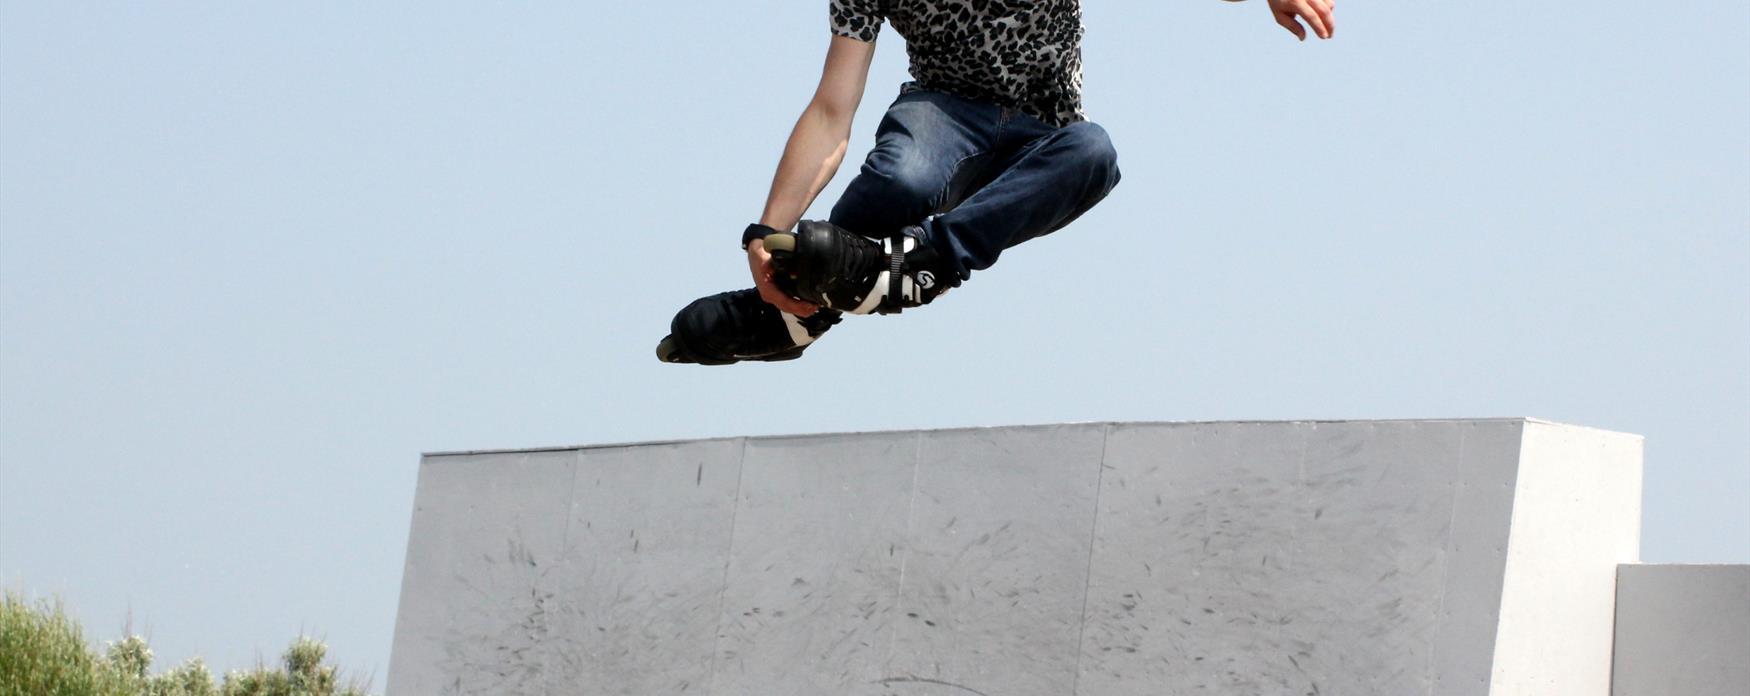 Extreme Skating